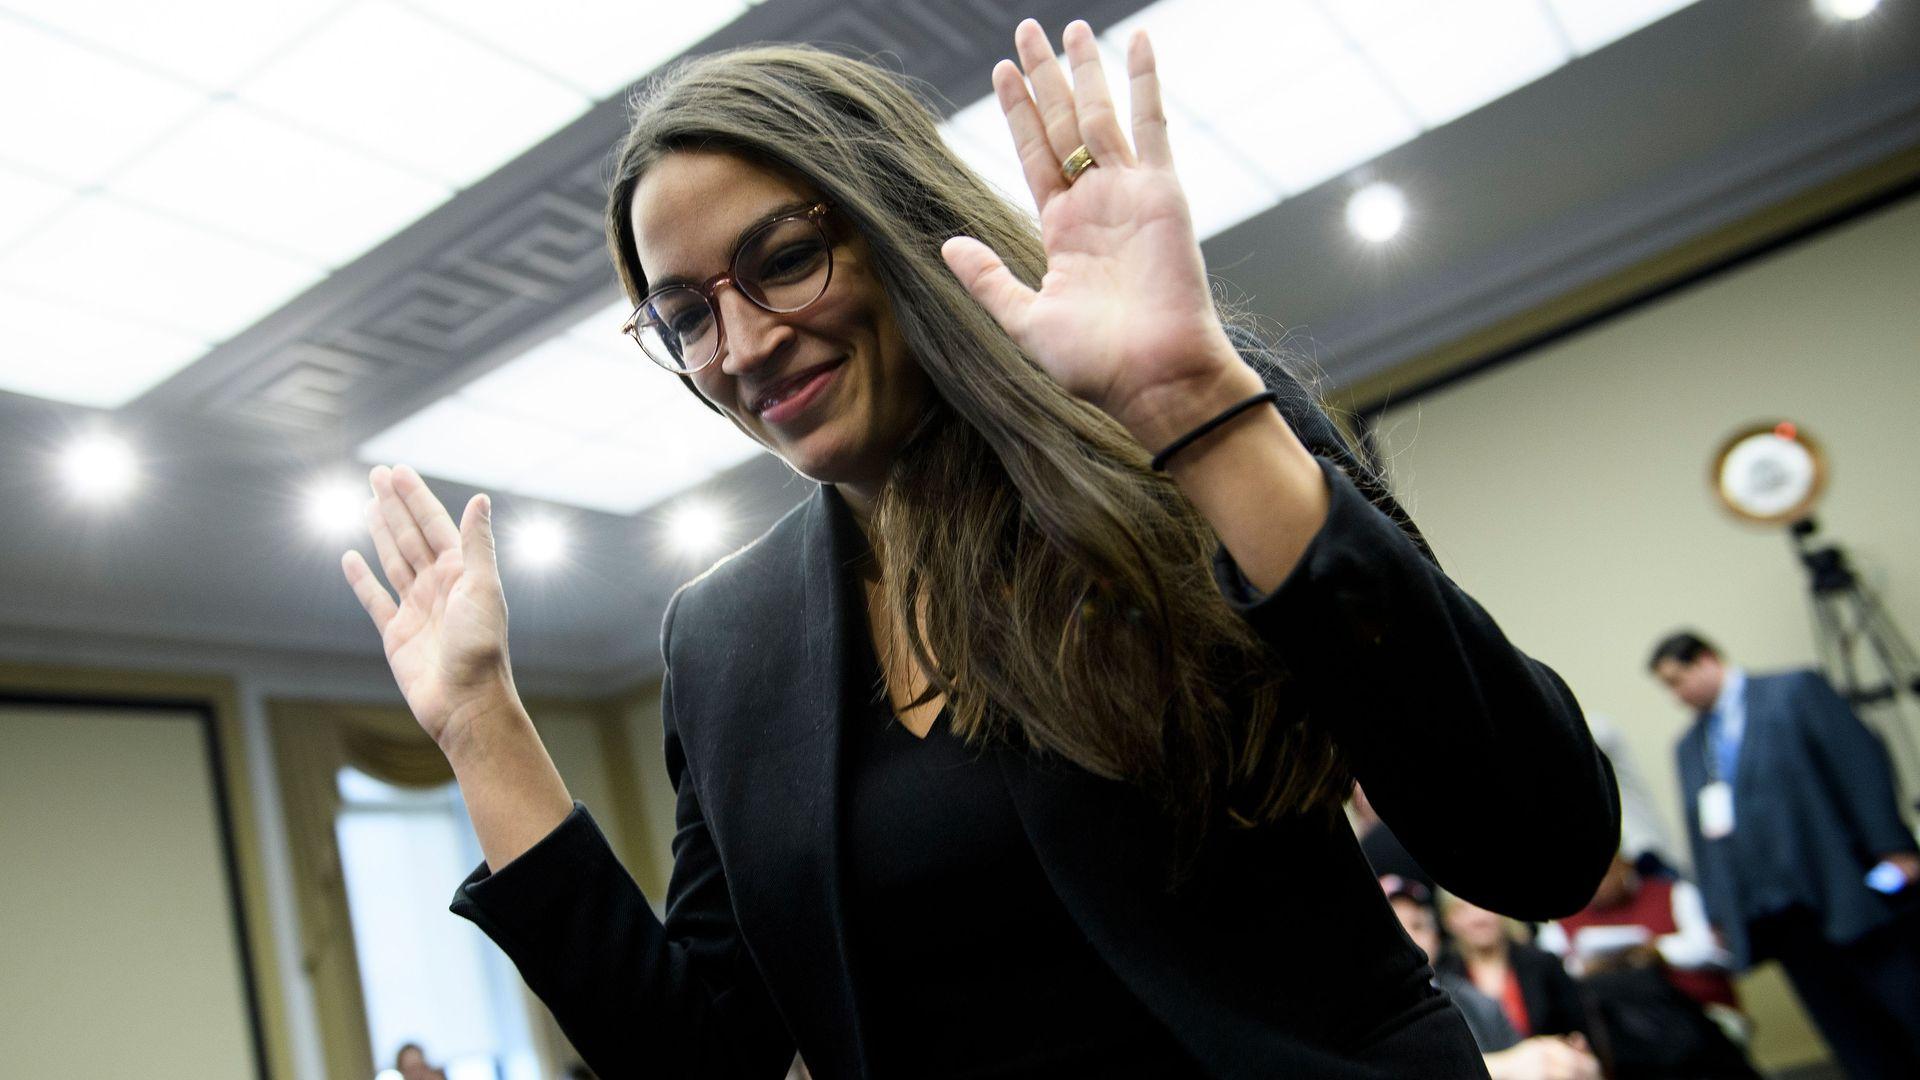 Alexandria ocasio cortez raises her hands.